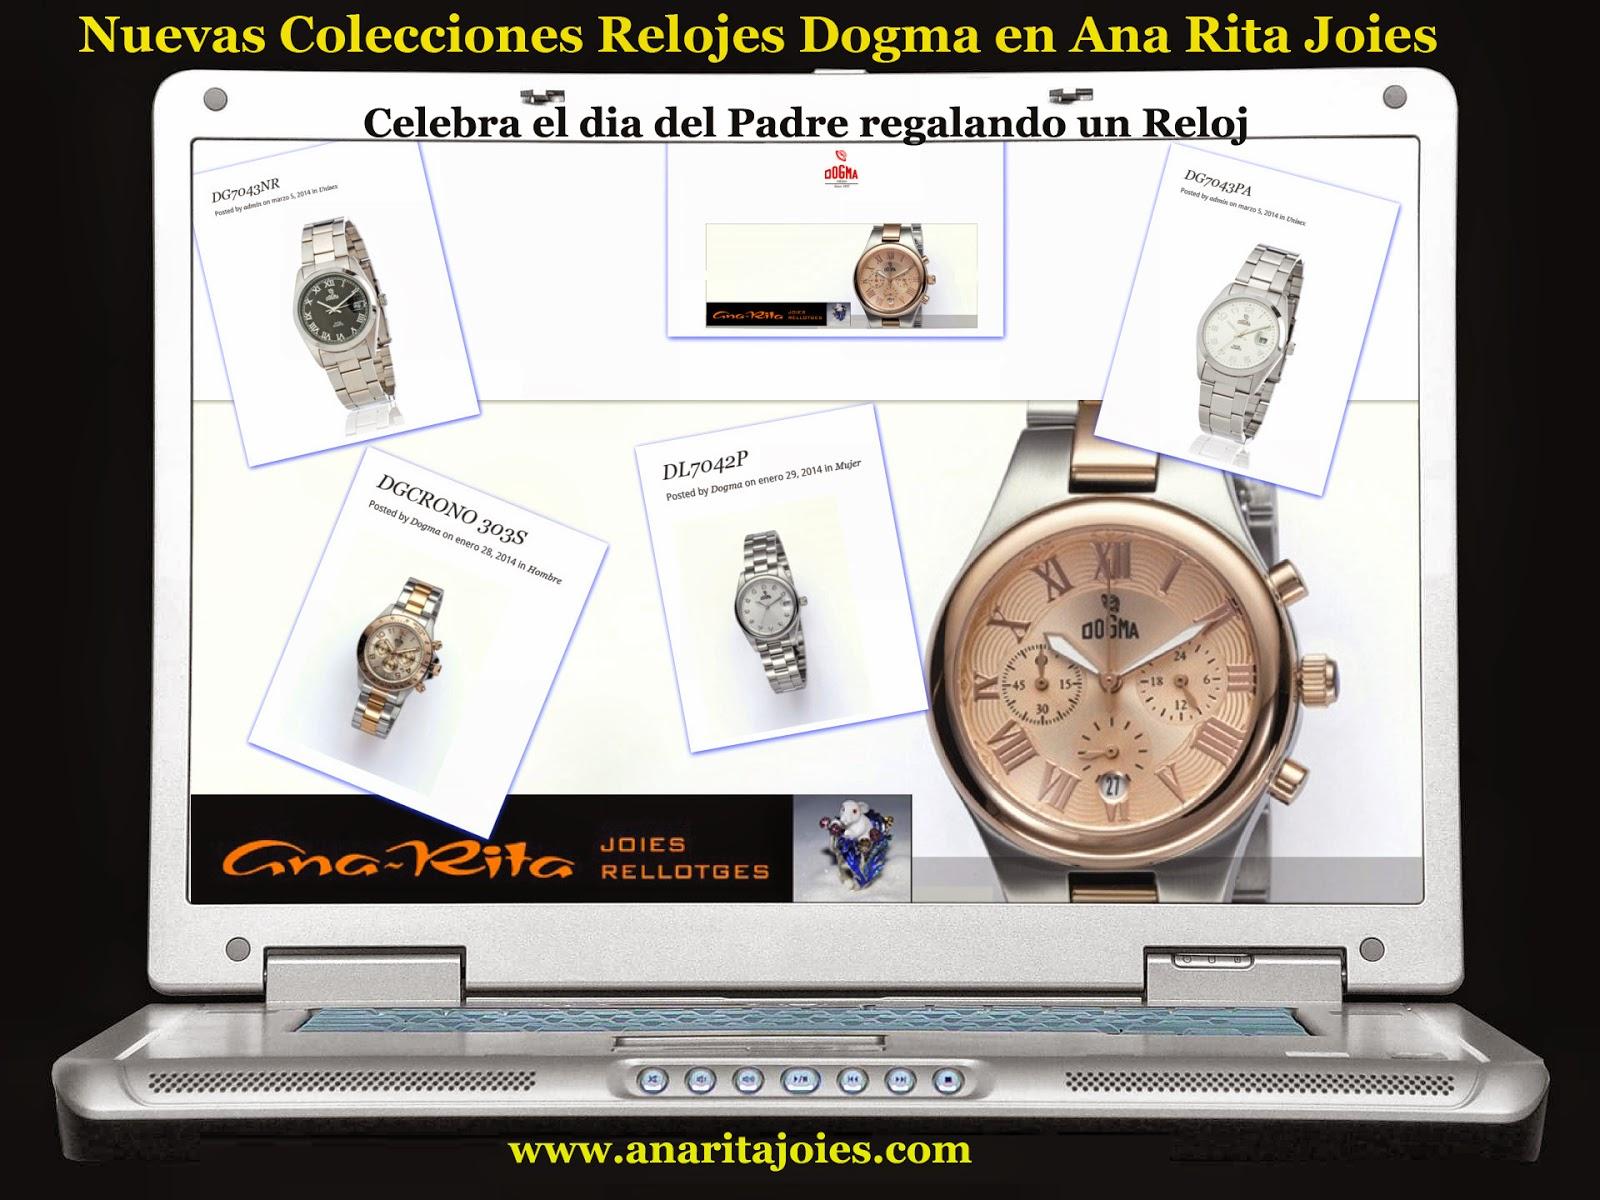 www.anaritajoies.com